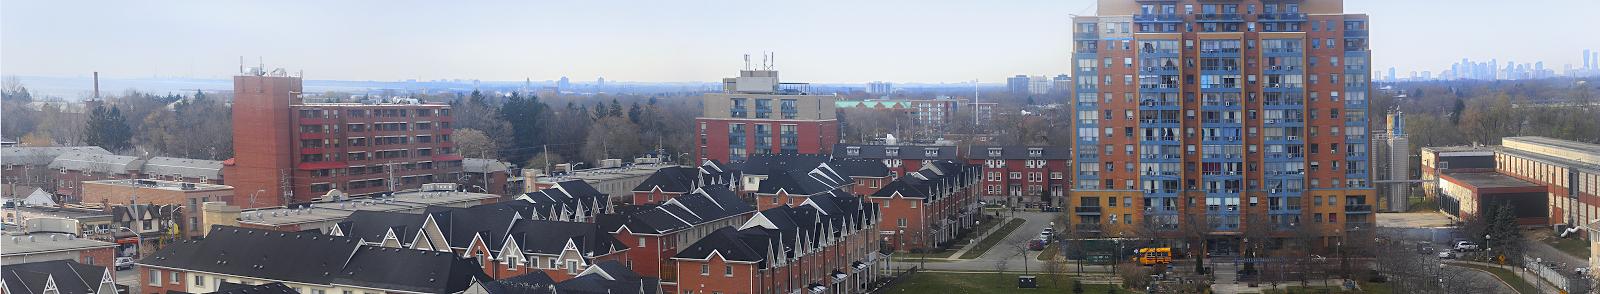 Panorama Image